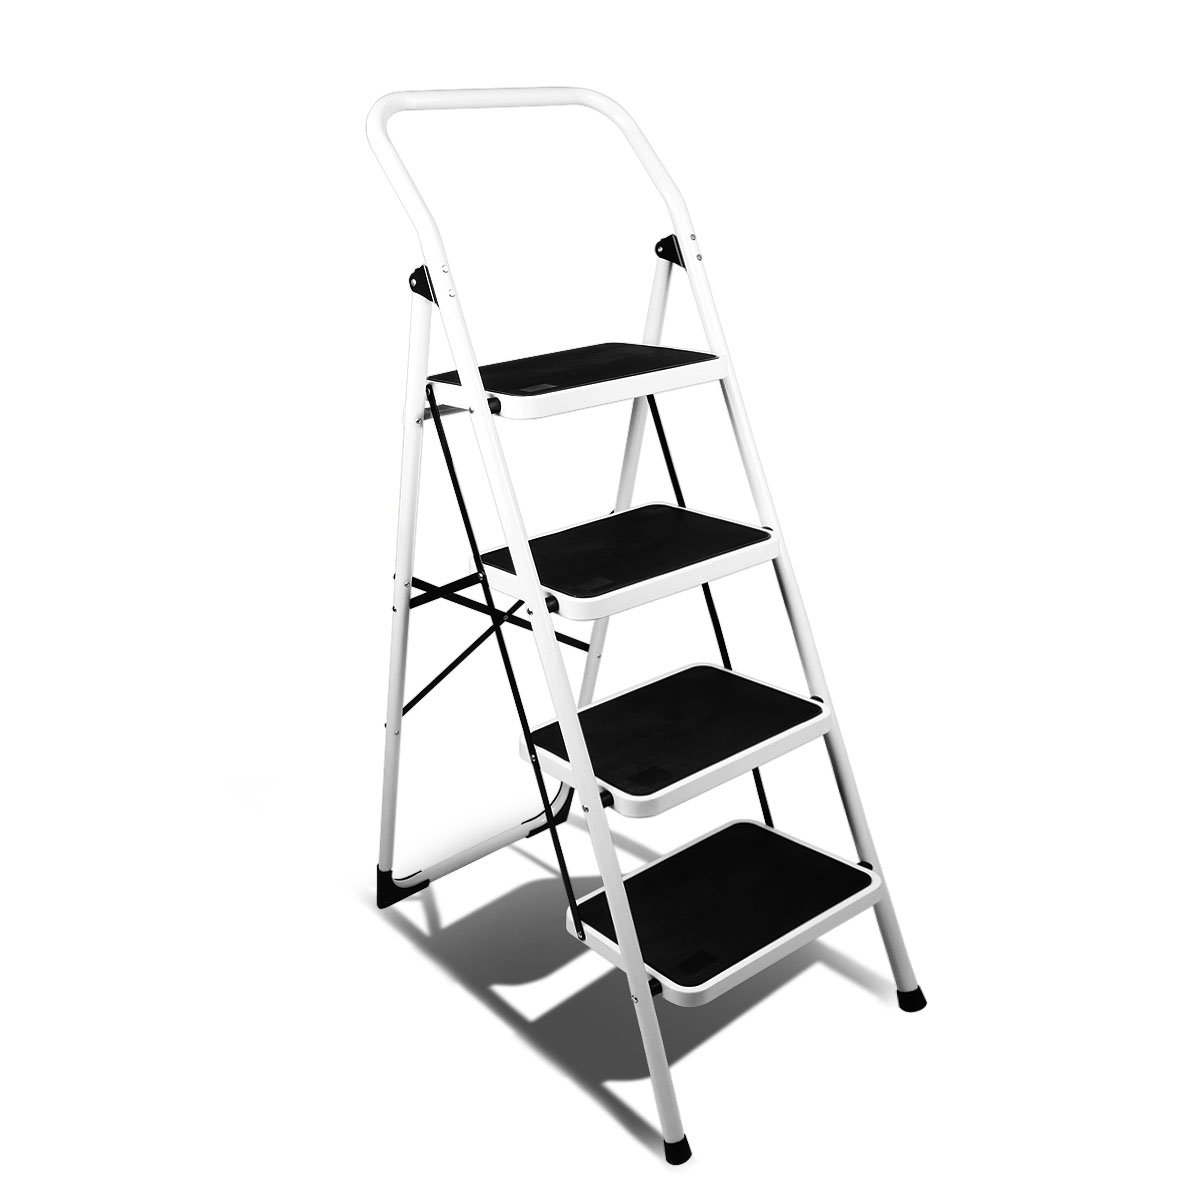 Magshion Ladder Platform Lightweight Folding Stool Heavy Duty Industrial Safety Space Saving (4 Step)